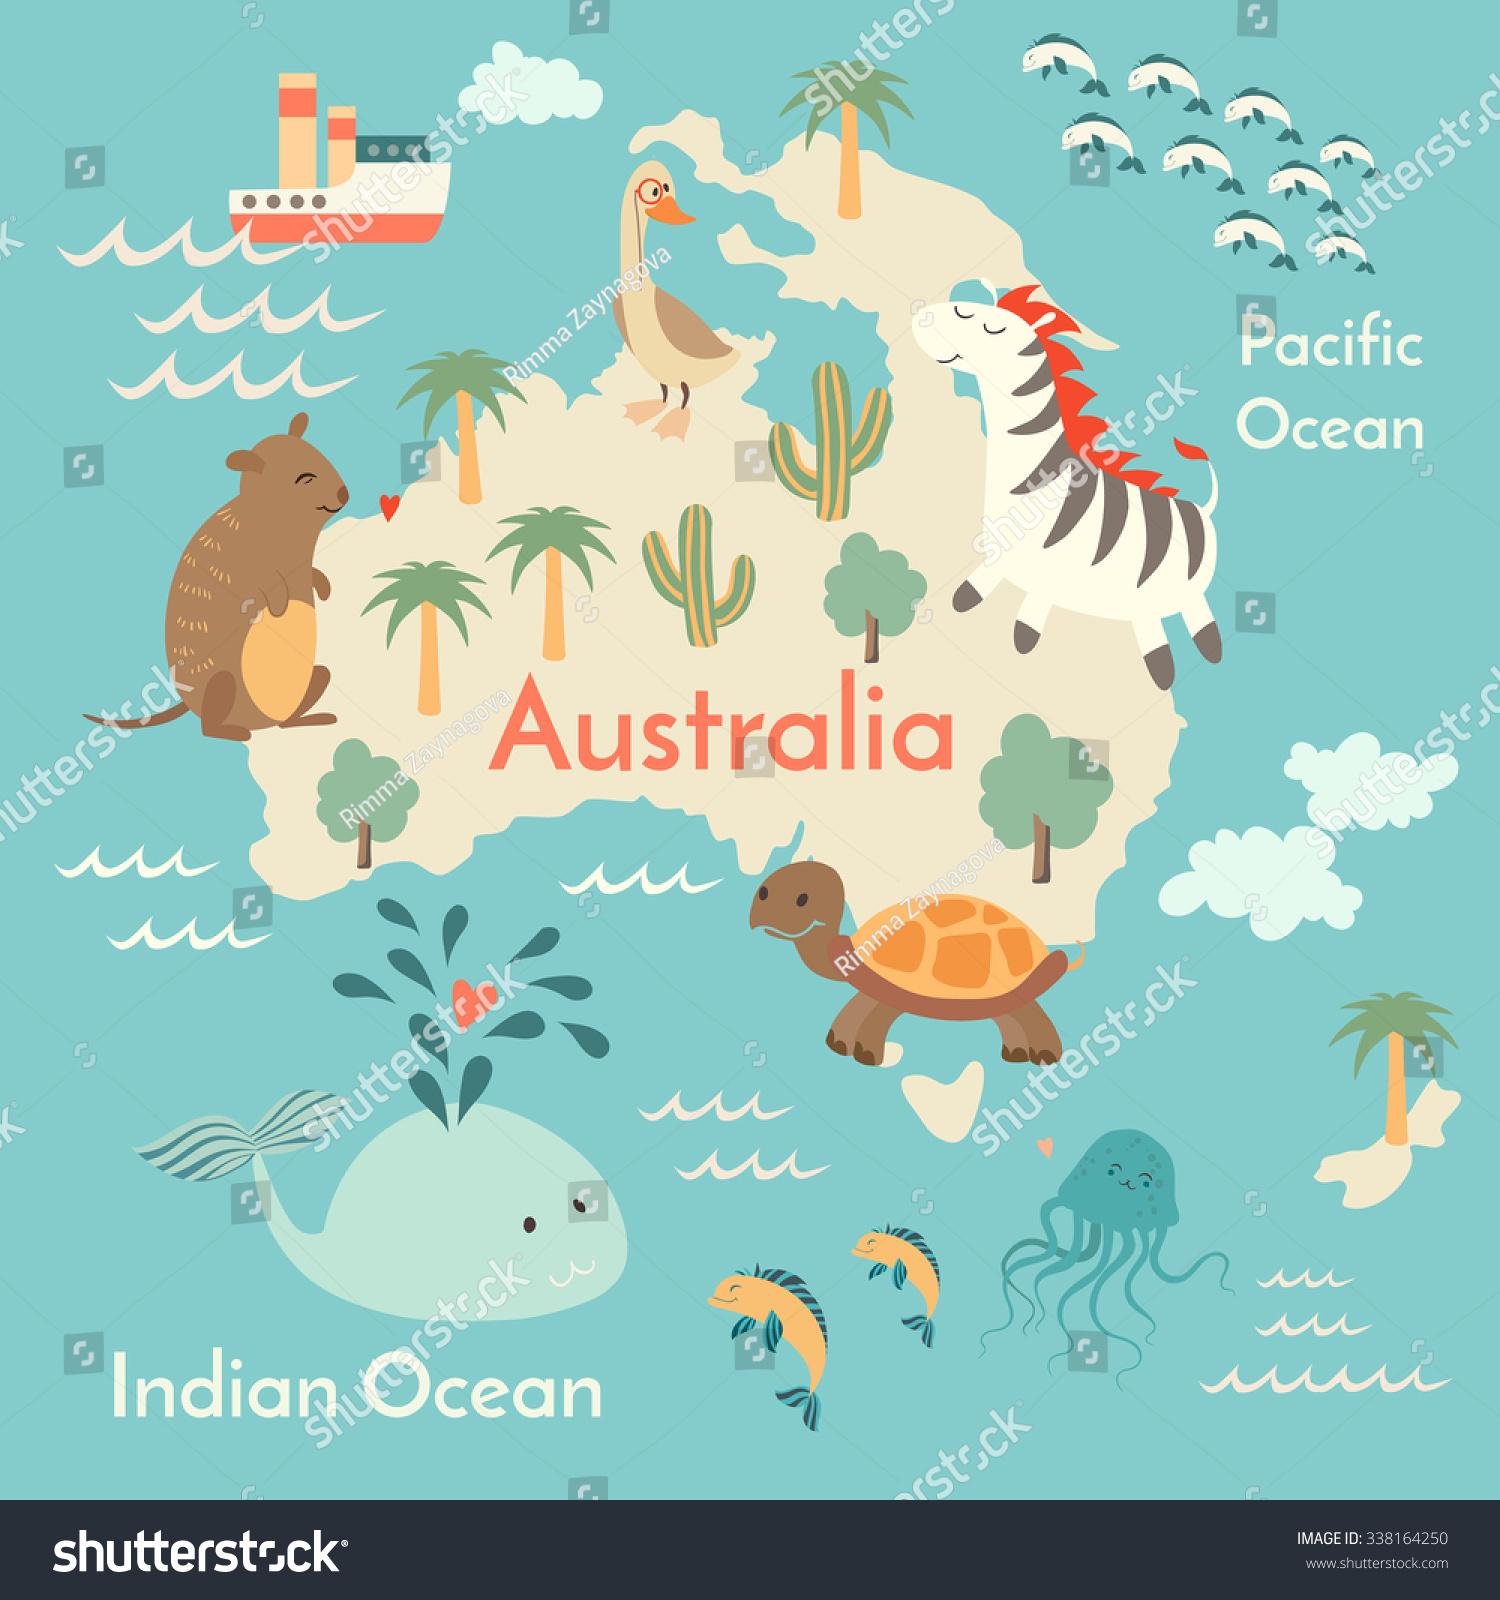 Animals World Map Australiaaustralia Map Childrenkids Vector – Map World Poster Kids